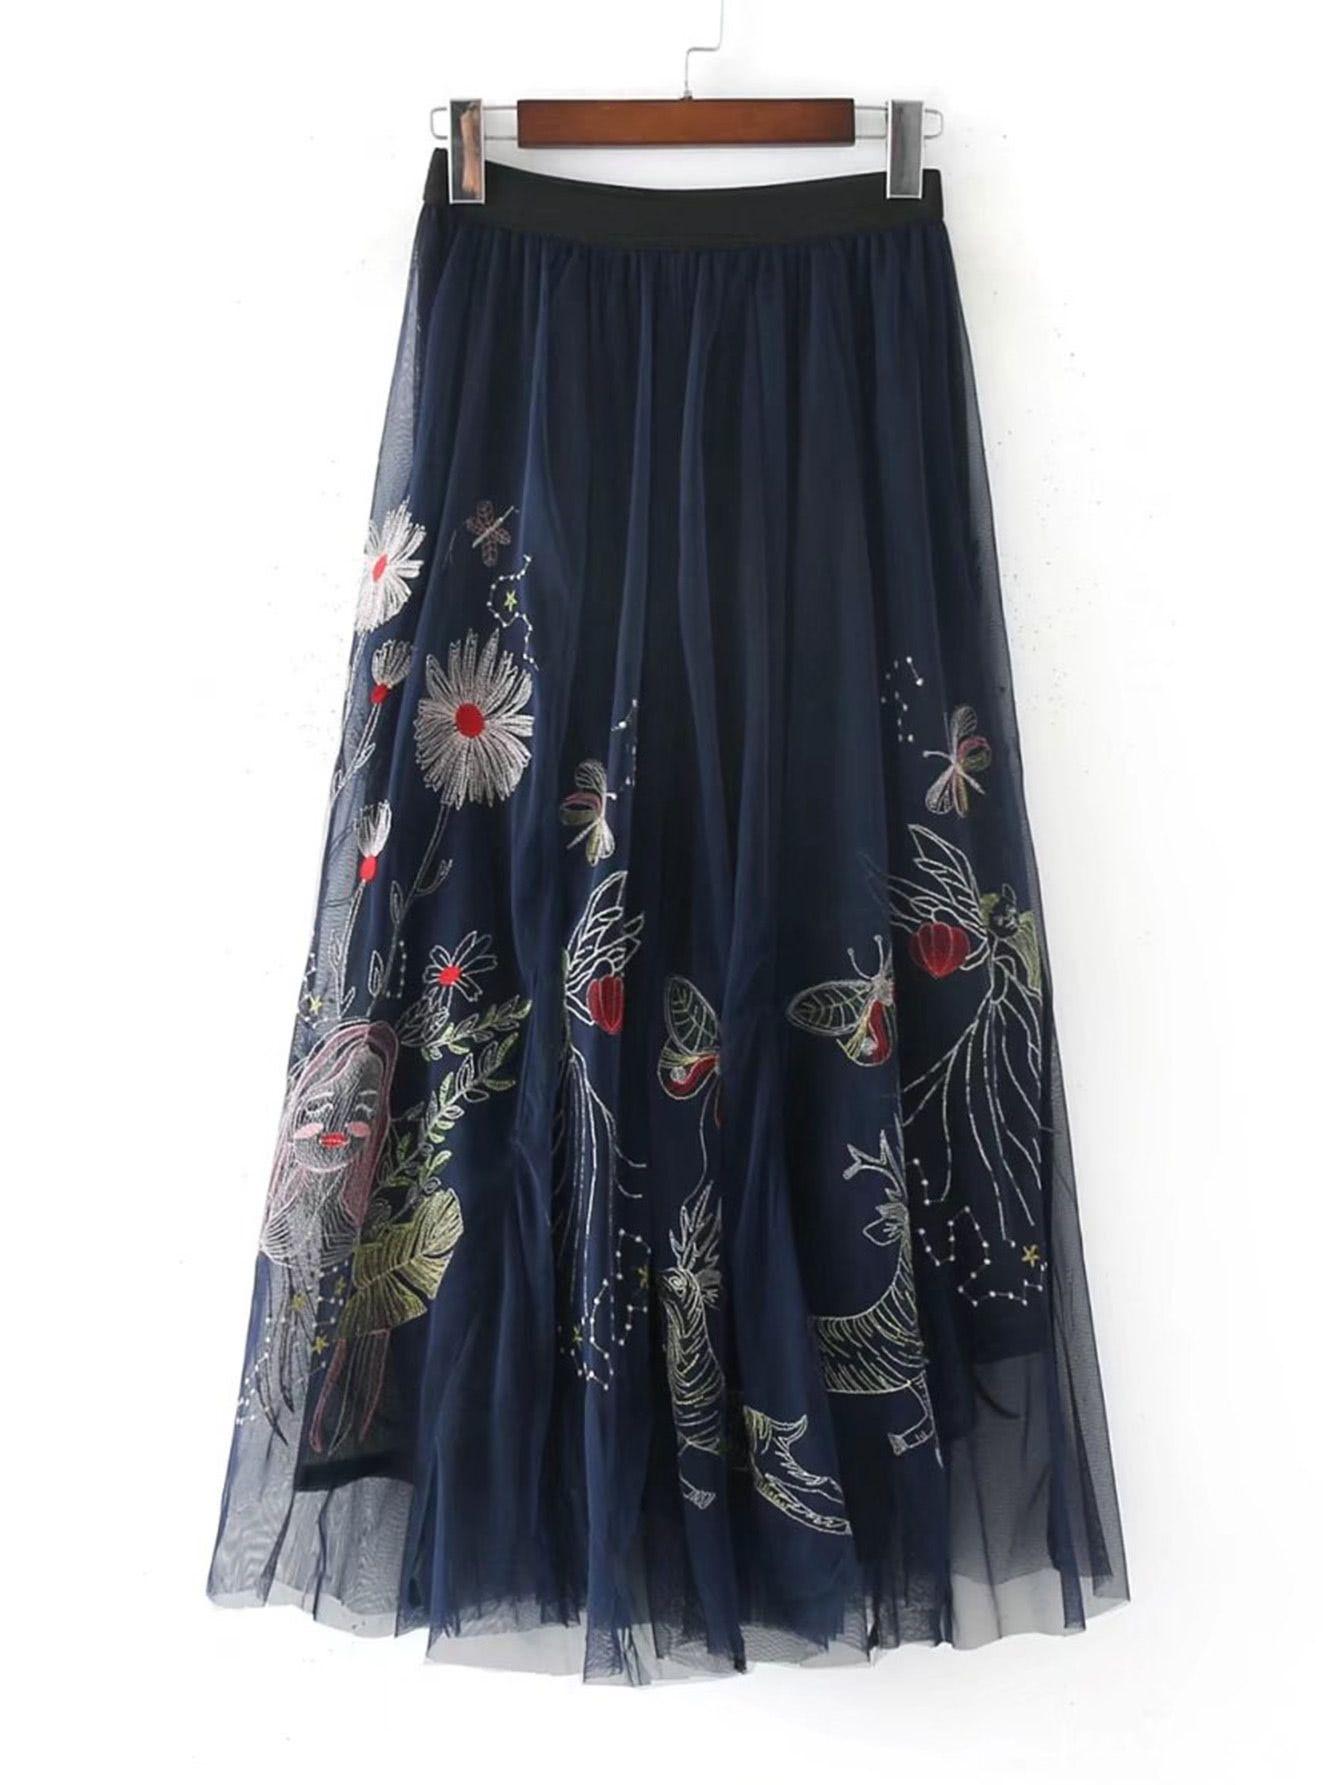 ef72da8f9 Shop All Over Flower Embroidered Mesh Overlay Skirt online. SheIn offers All  Over Flower Embroidered Mesh Overlay Skirt & more to fit y…